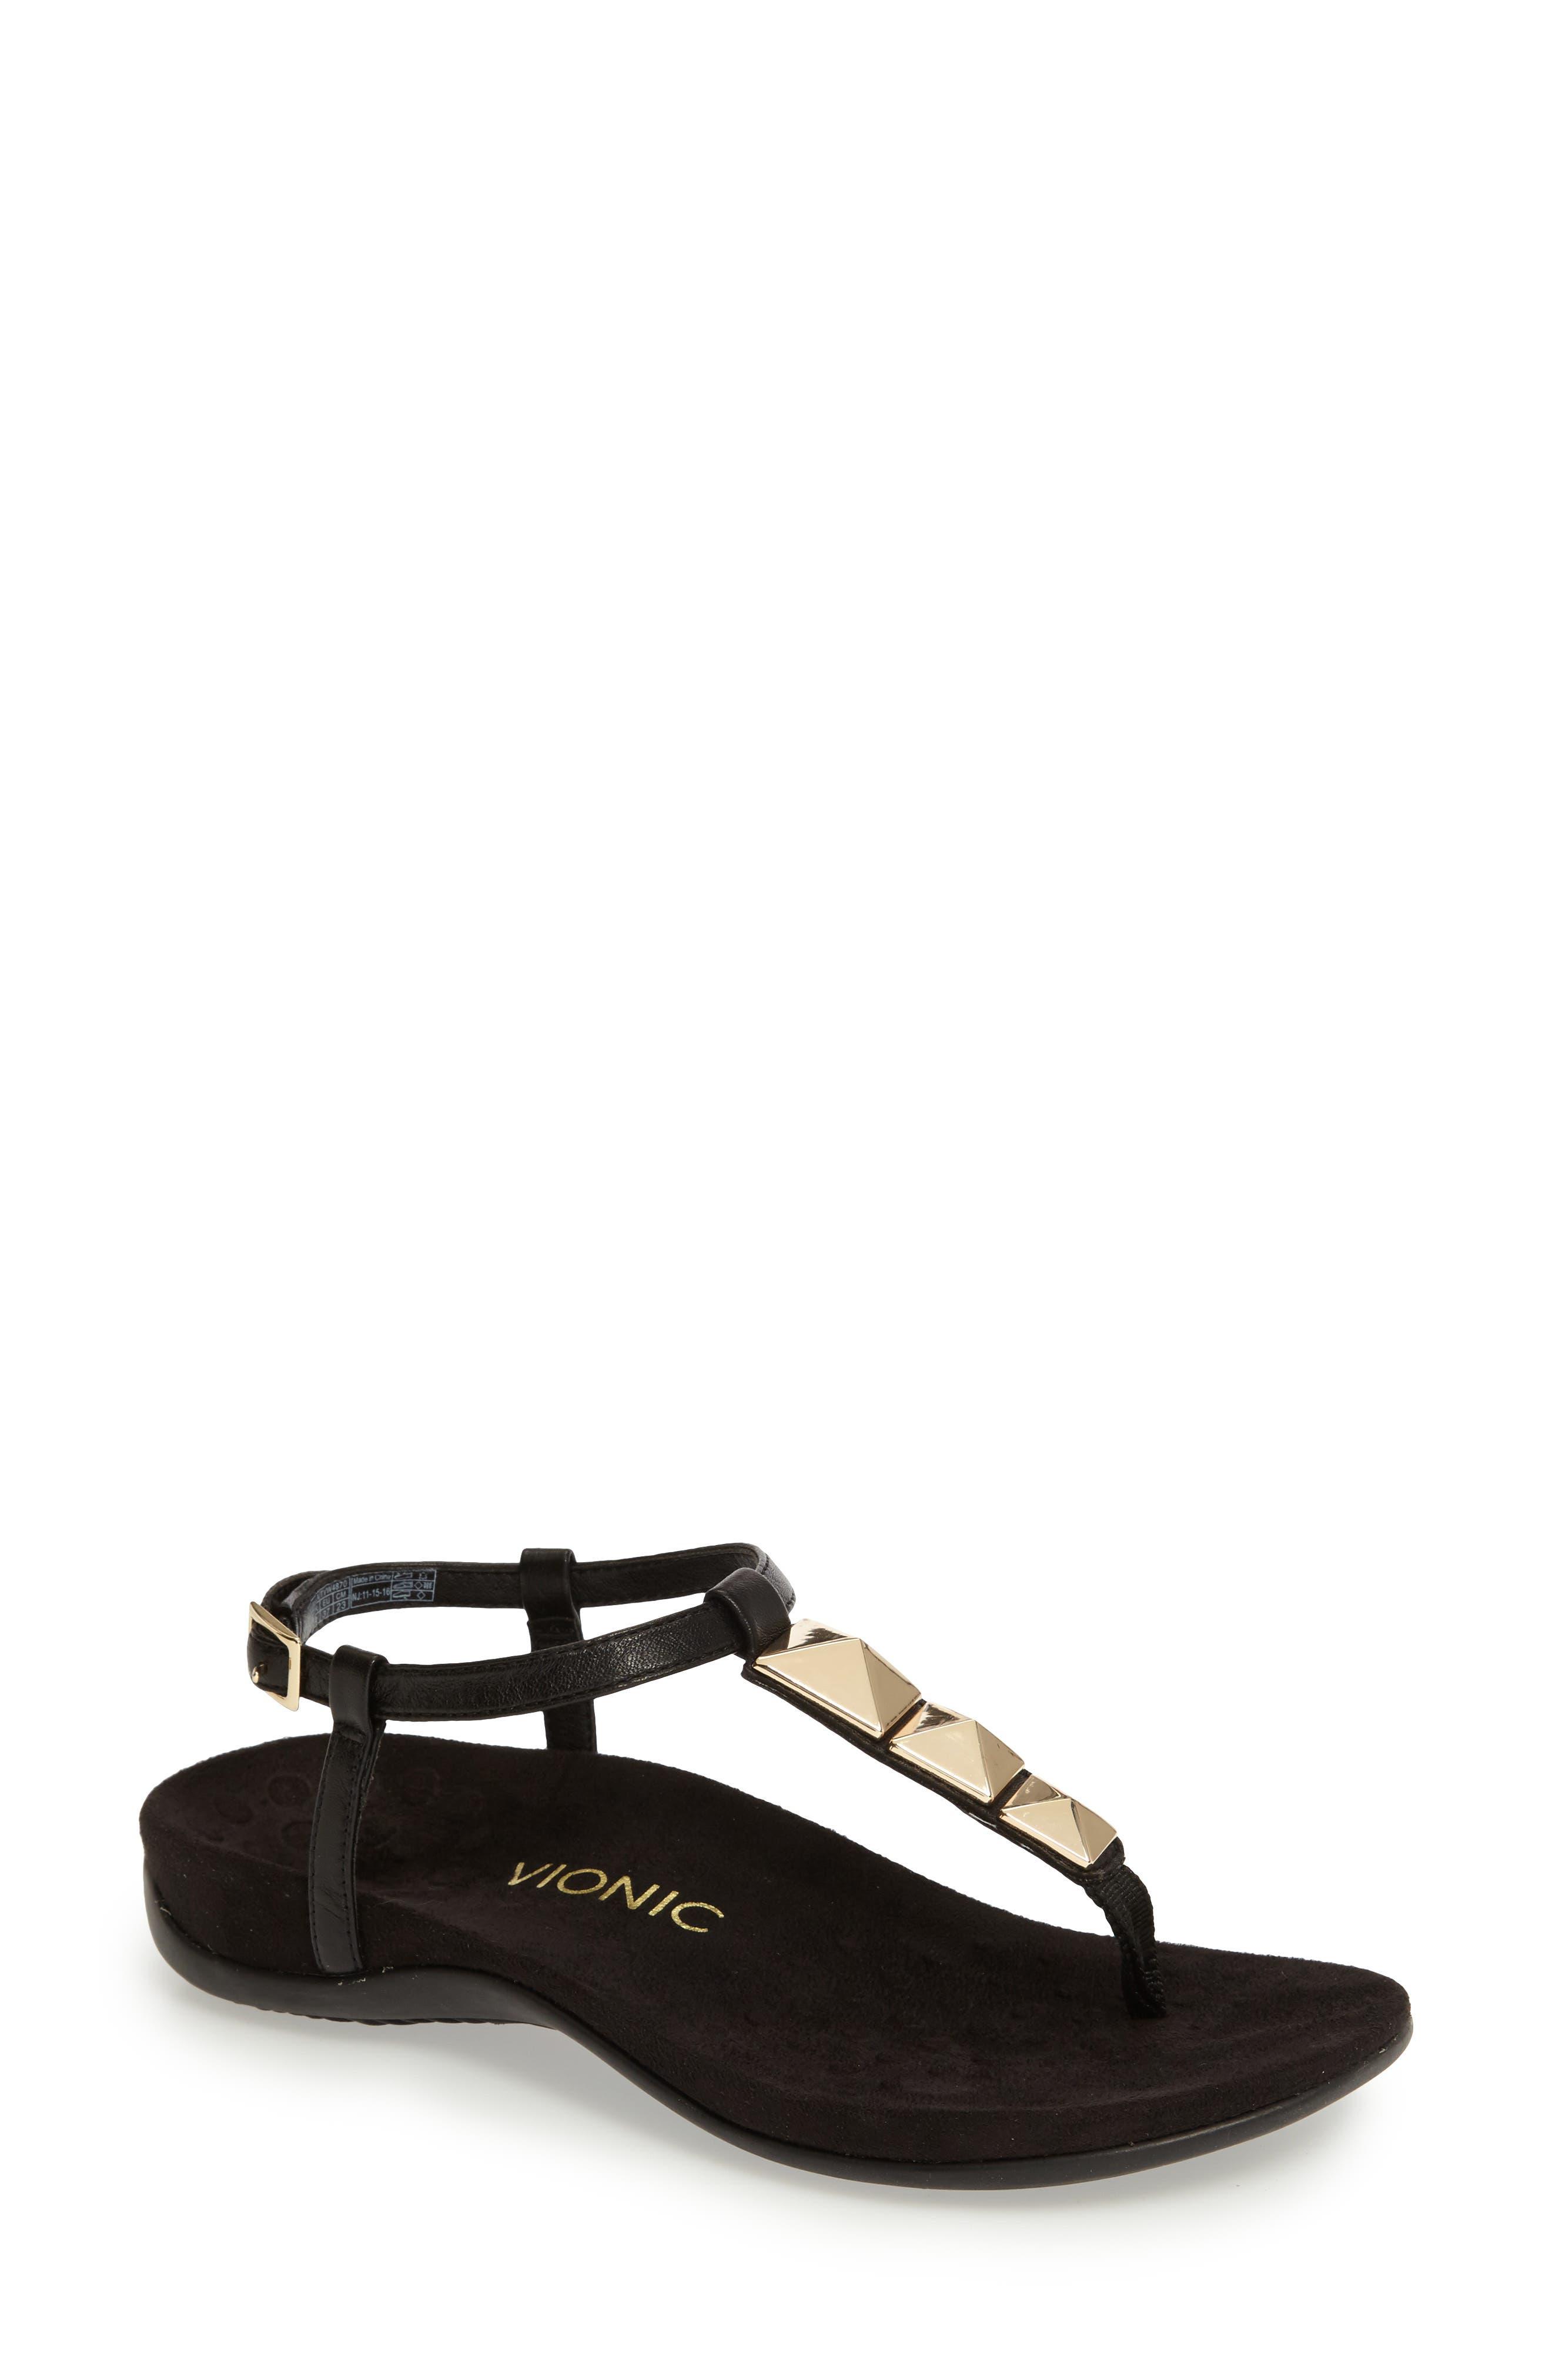 Nala T-Strap Sandal,                         Main,                         color,